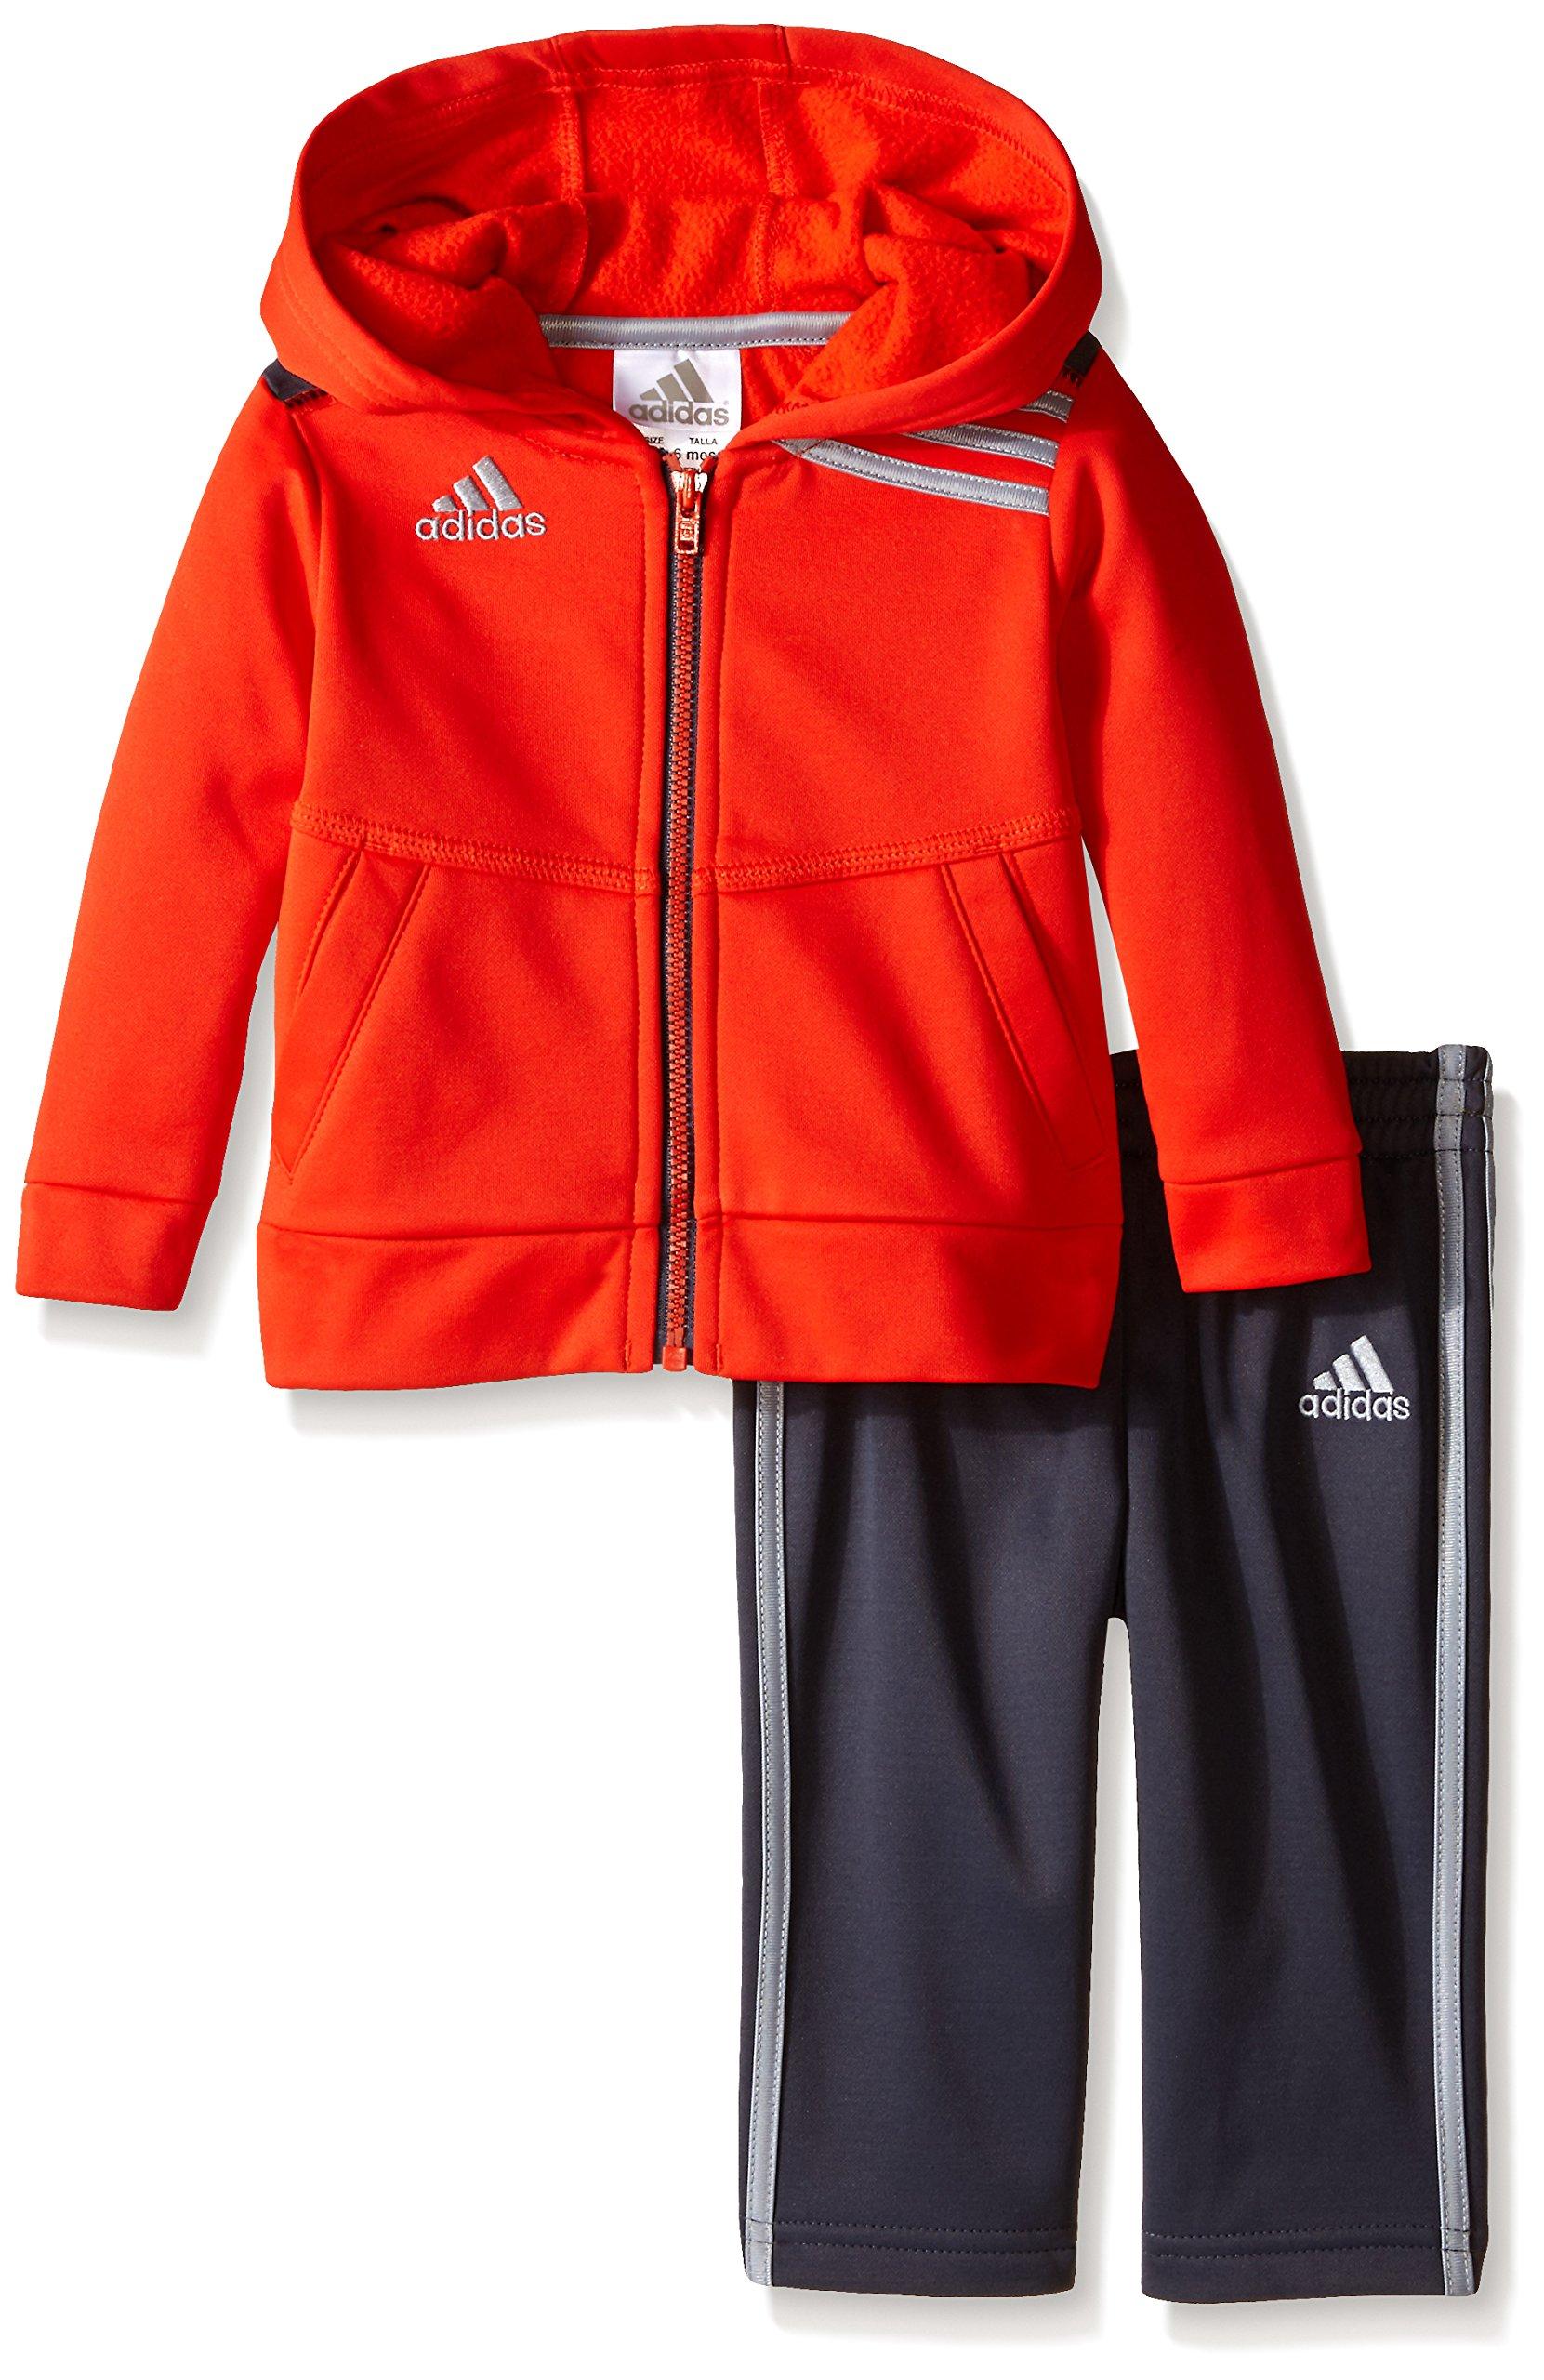 adidas Baby Boys' Zip Hoodie and Pant Set, Mercury Grey/Red, 12 Months